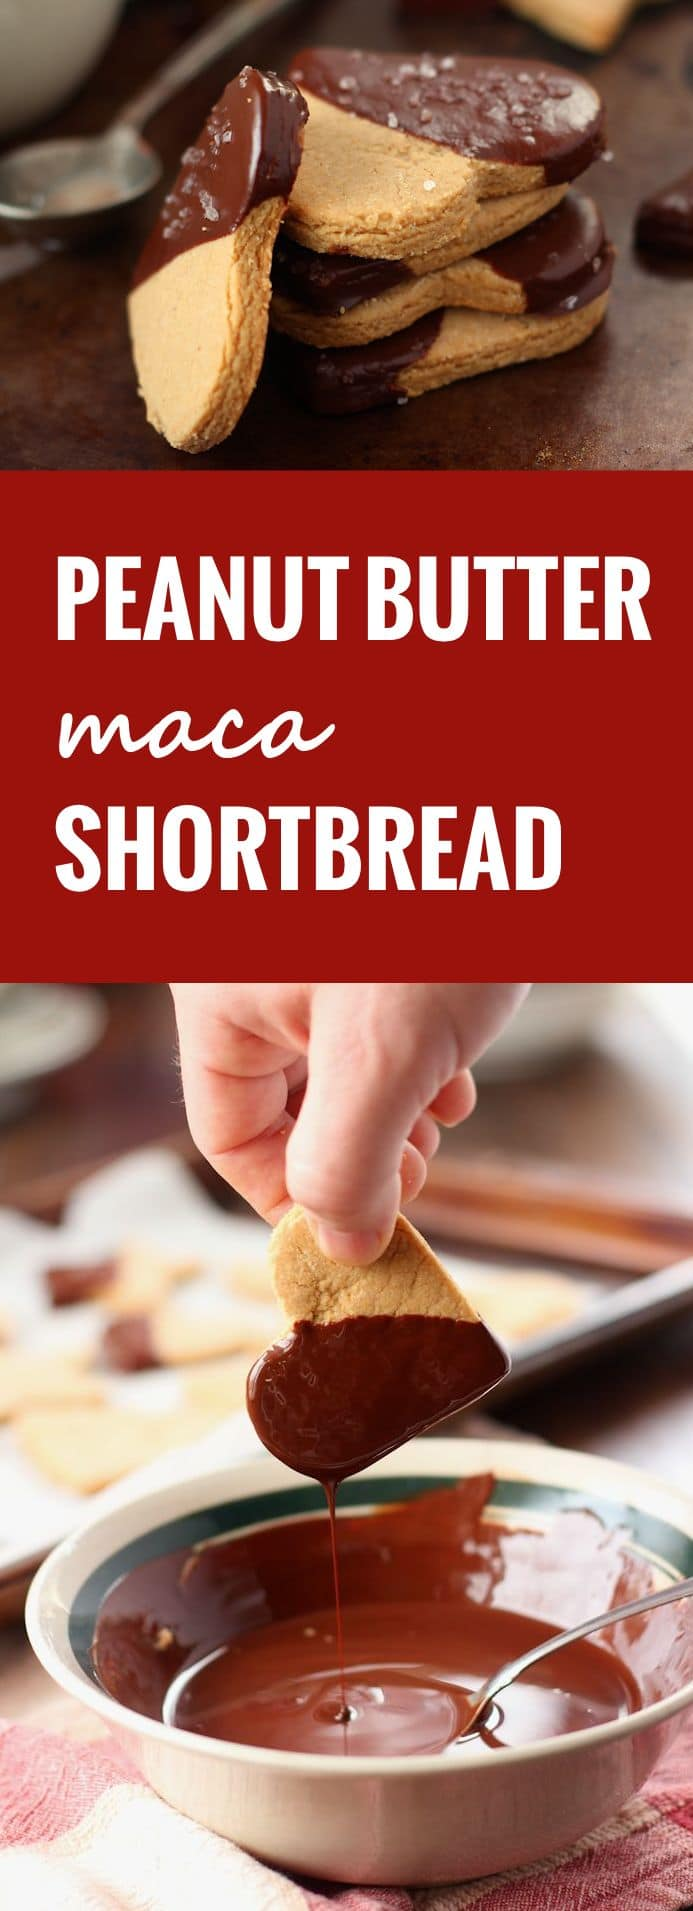 Salted Chocolate Maca Peanut Butter Shortbread Cookies